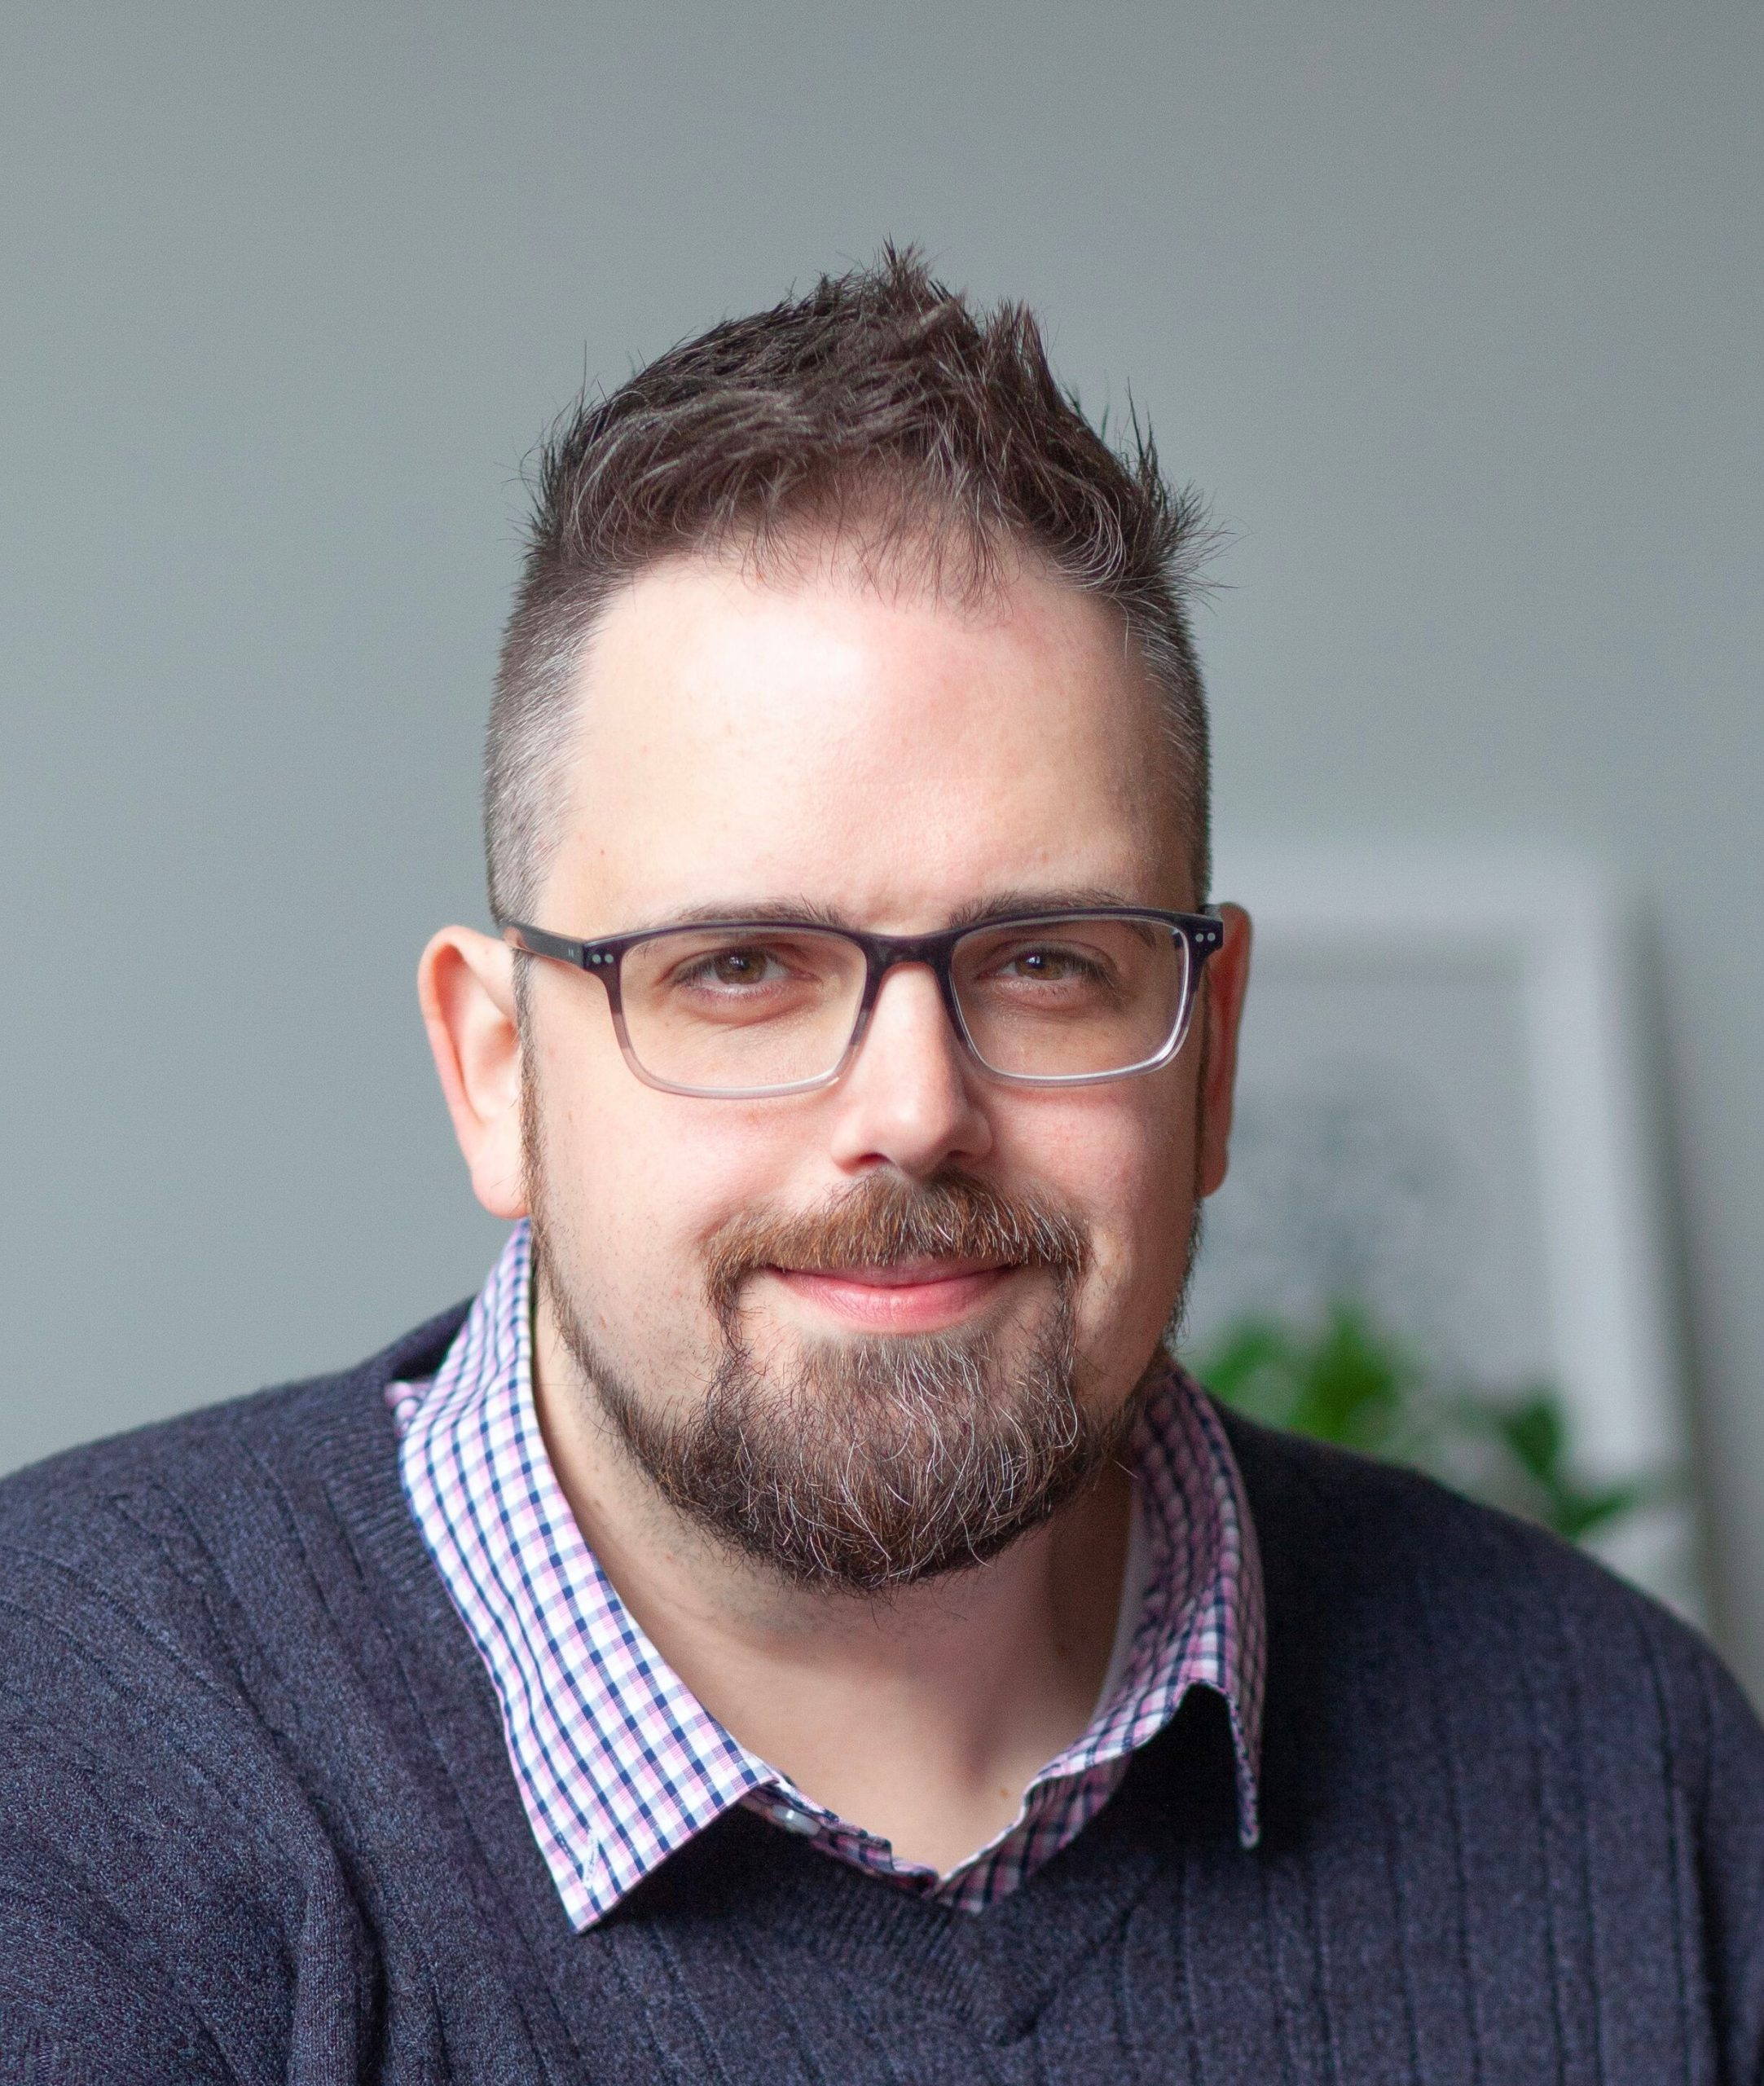 <strong>John Cornthwait,</strong> <em>Partner + Director of Products, Firefli</em>